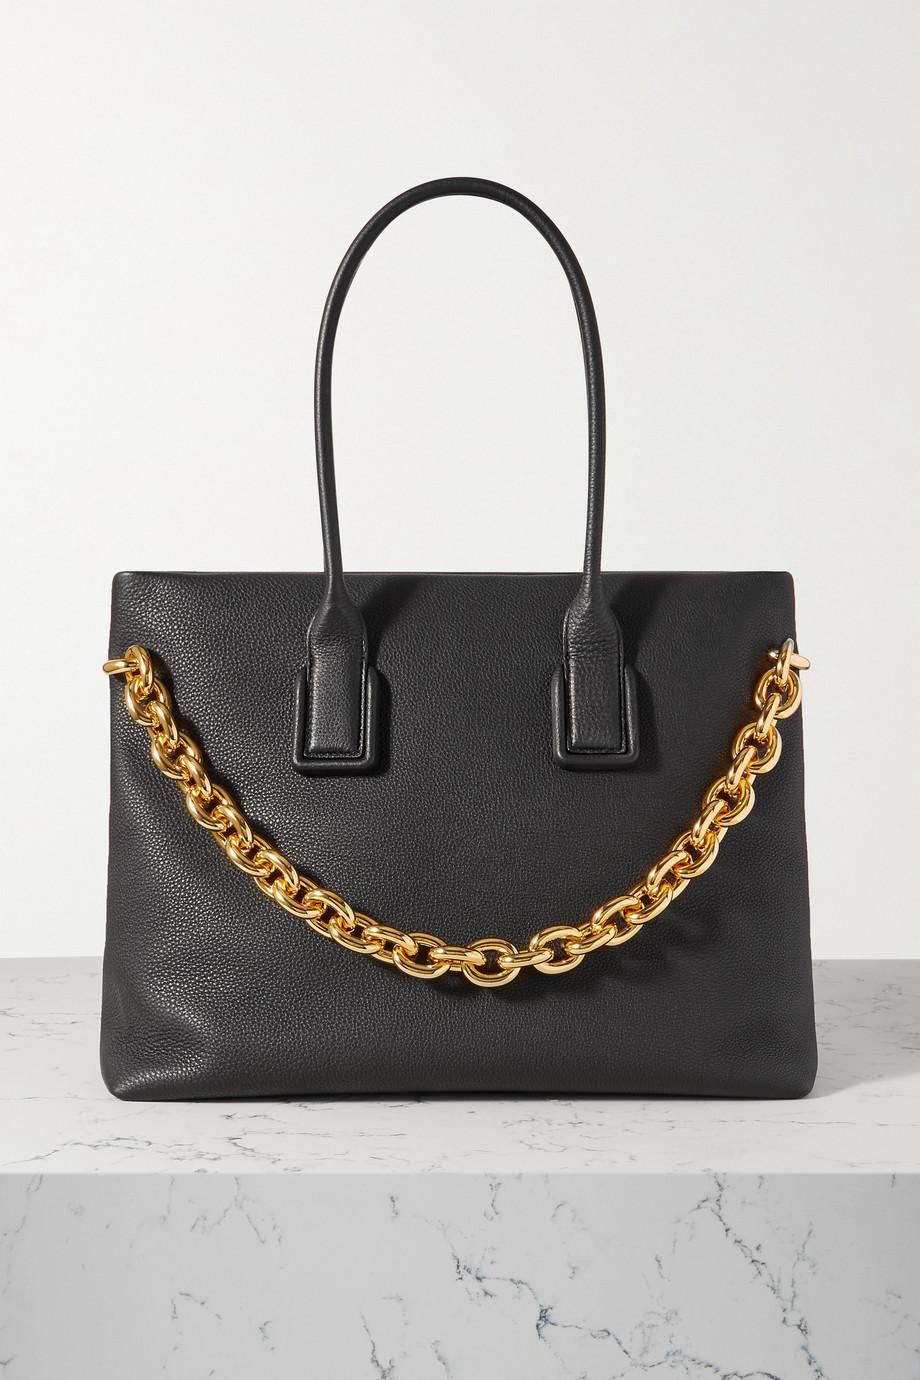 Bottega Veneta Chain Tote aus strukturiertem Leder